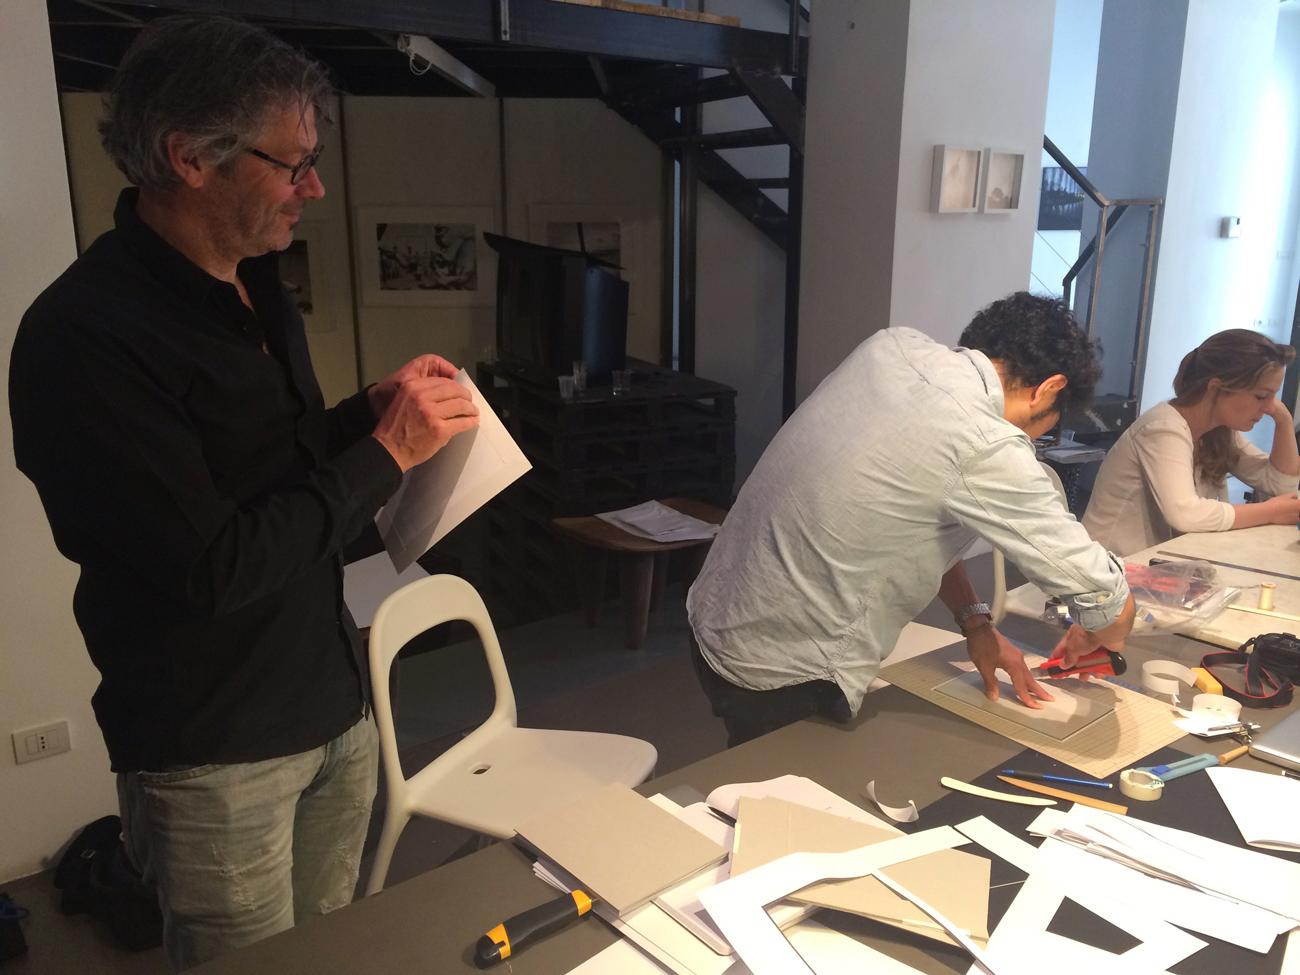 Teun and Kazuma helping me out with the binding